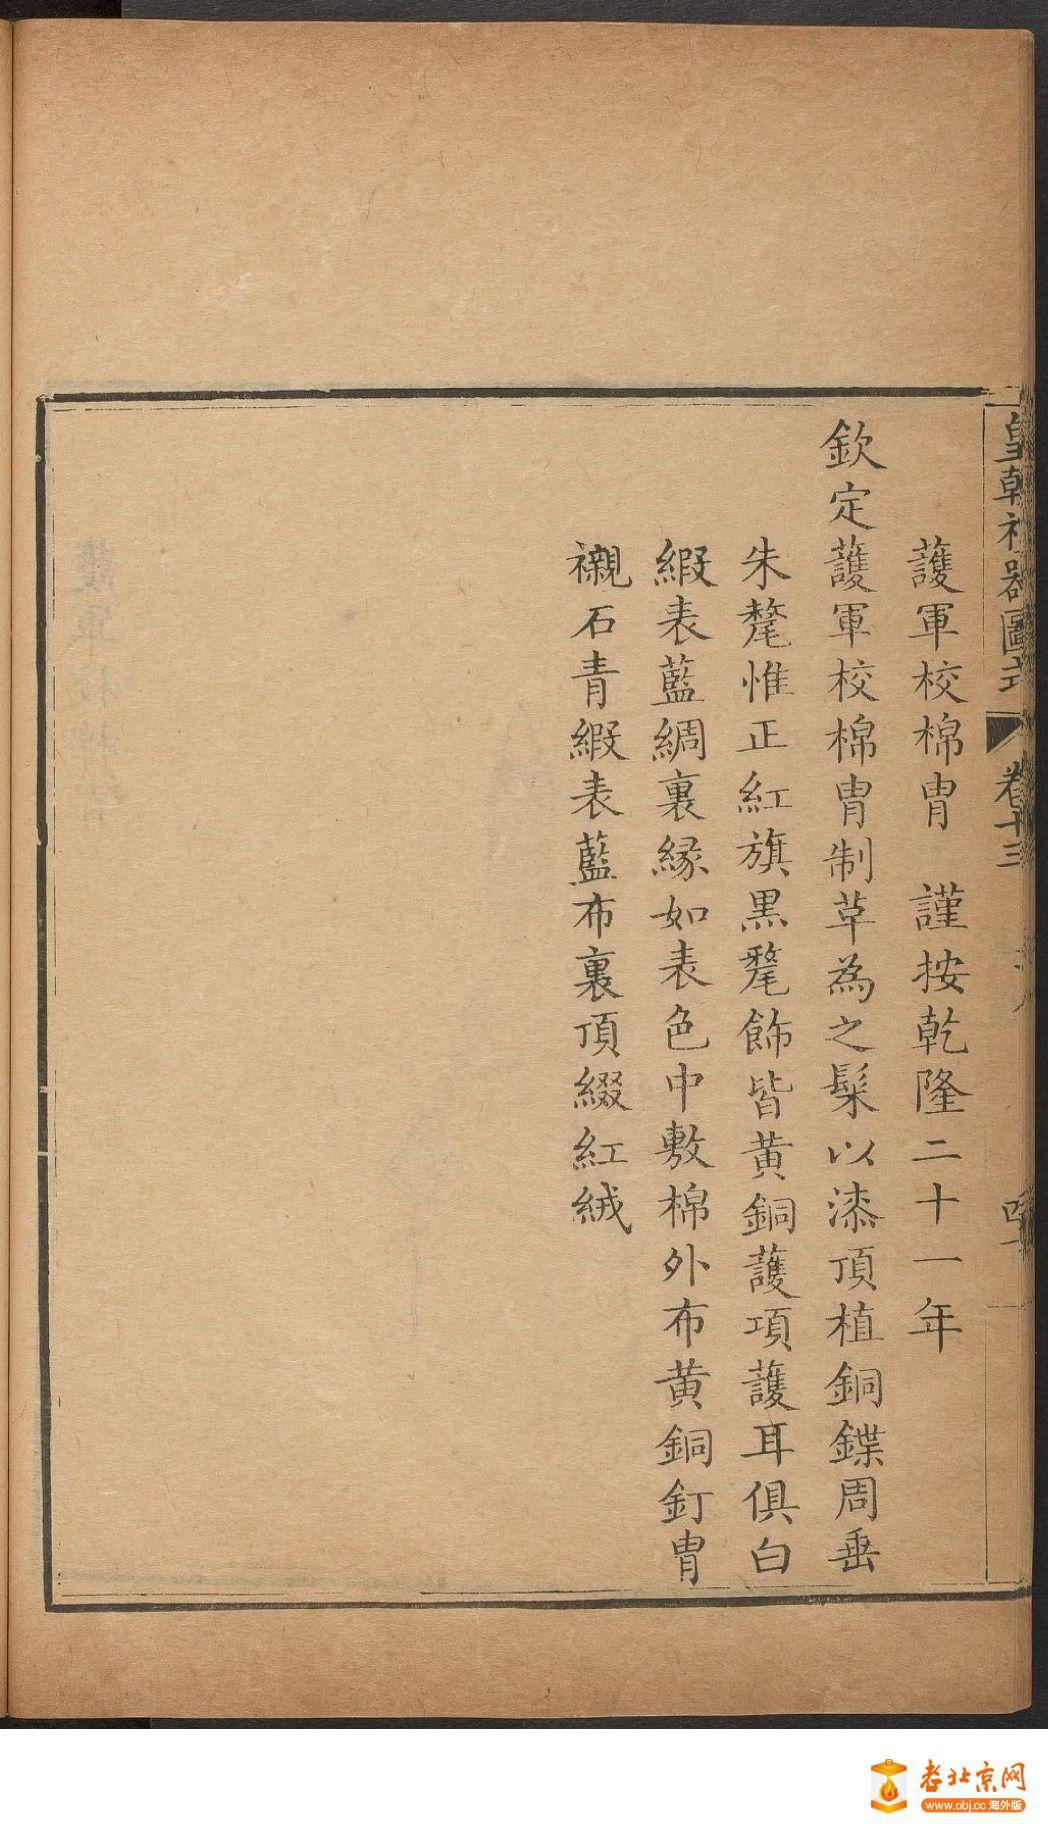 5_page1_image1b.jpg